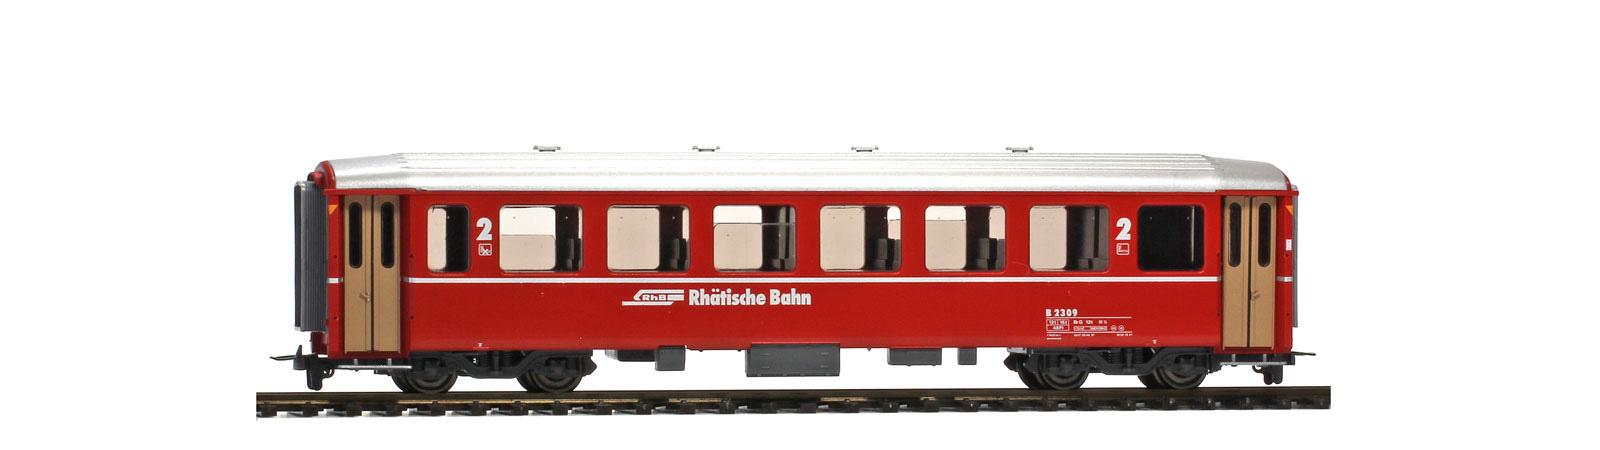 3255149 RhB B 2309 EW I Berninabahn rot-1